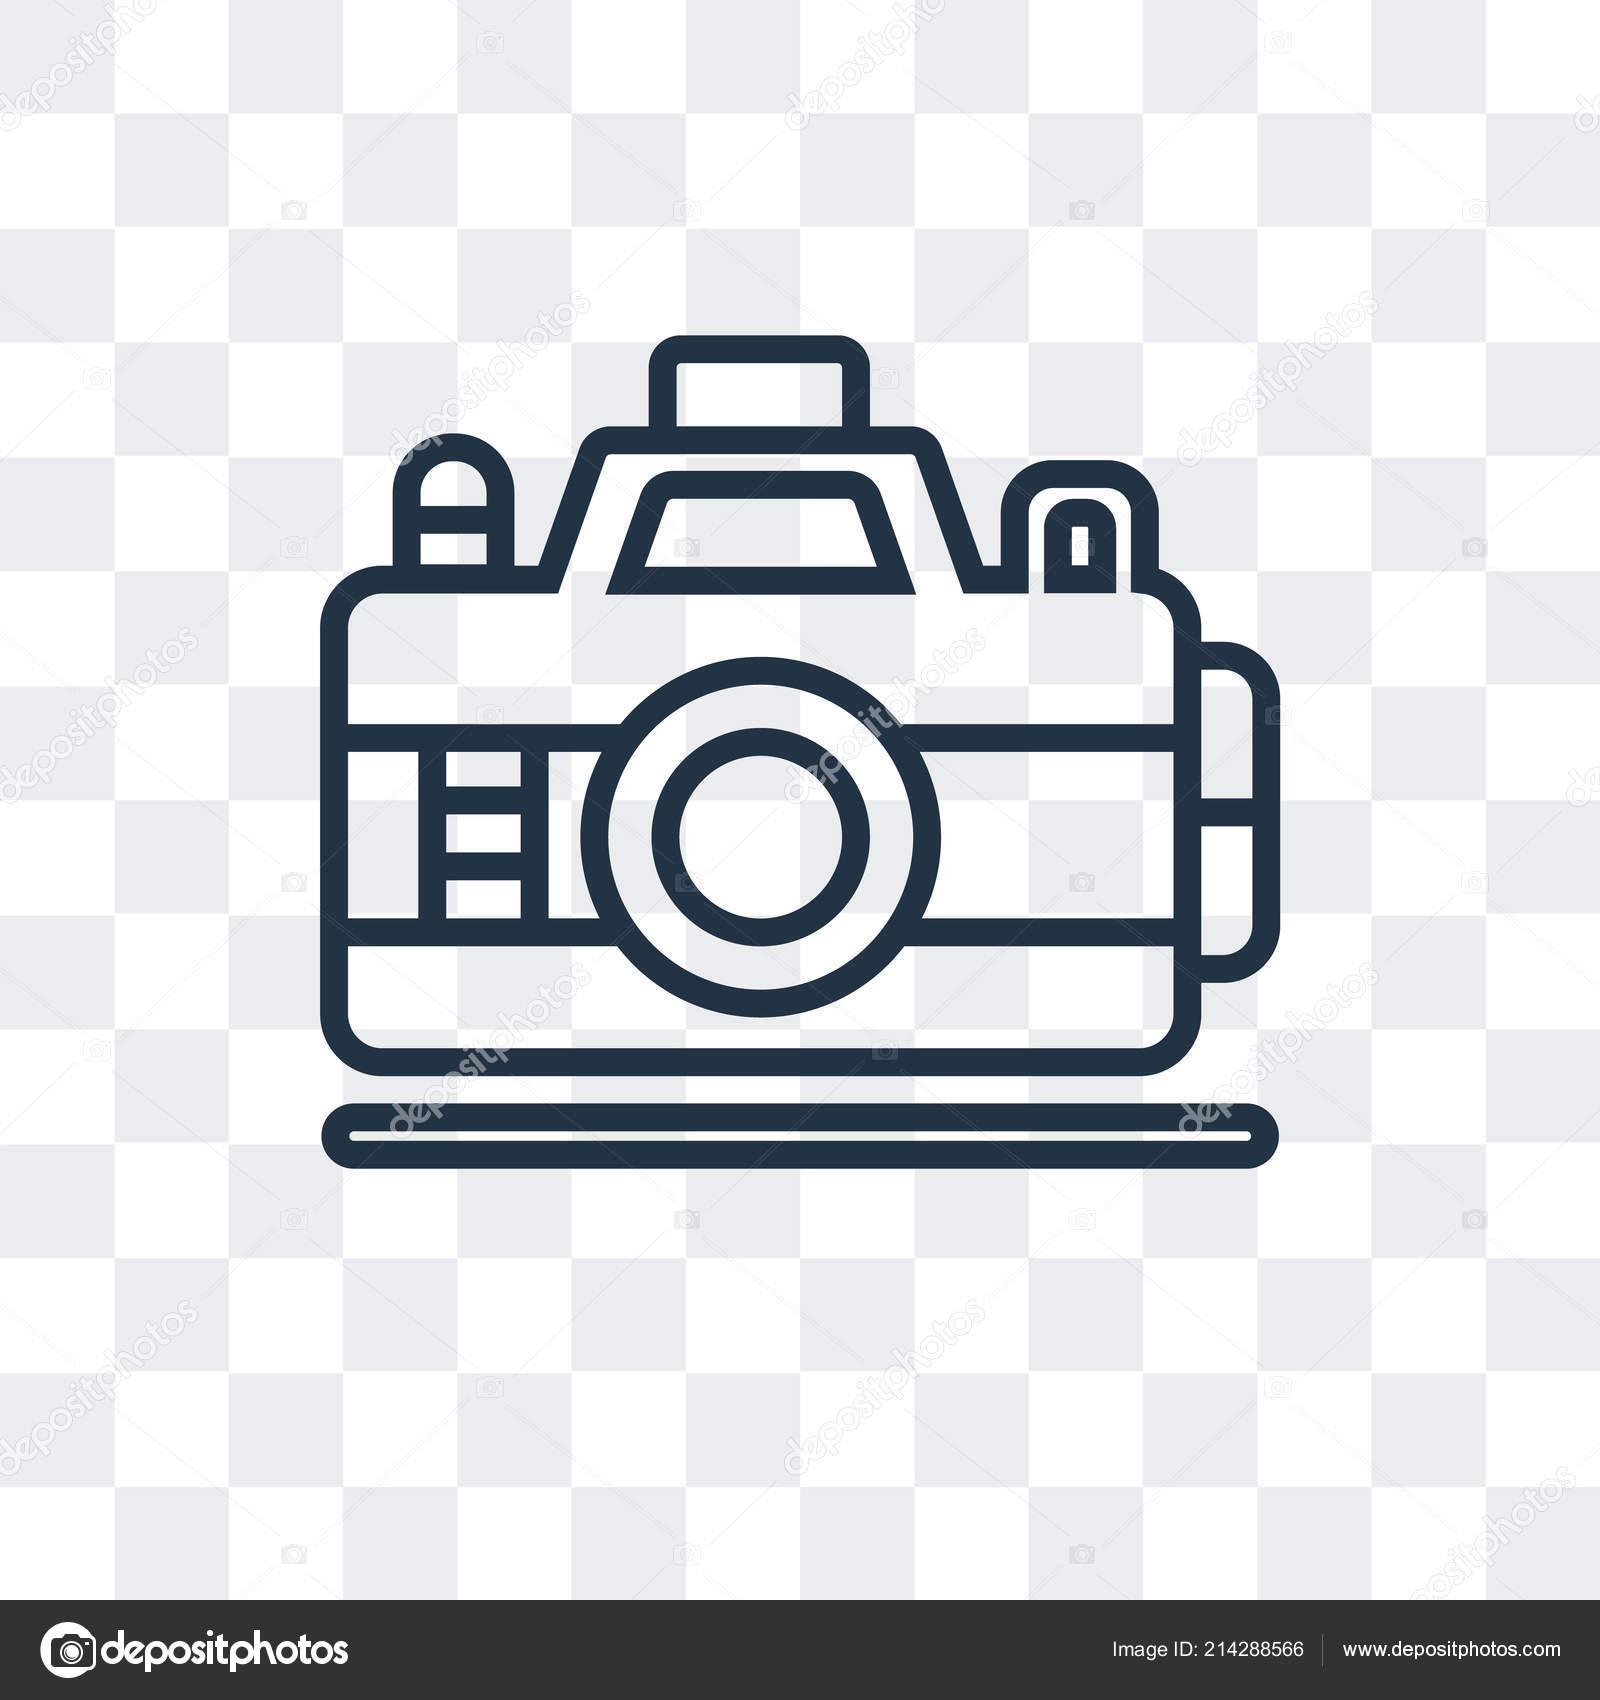 Photo Camera Vector Icon Isolated On Transparent Background Photo Camera Logo Design Stock Vector C Bestvectorstock 214288566